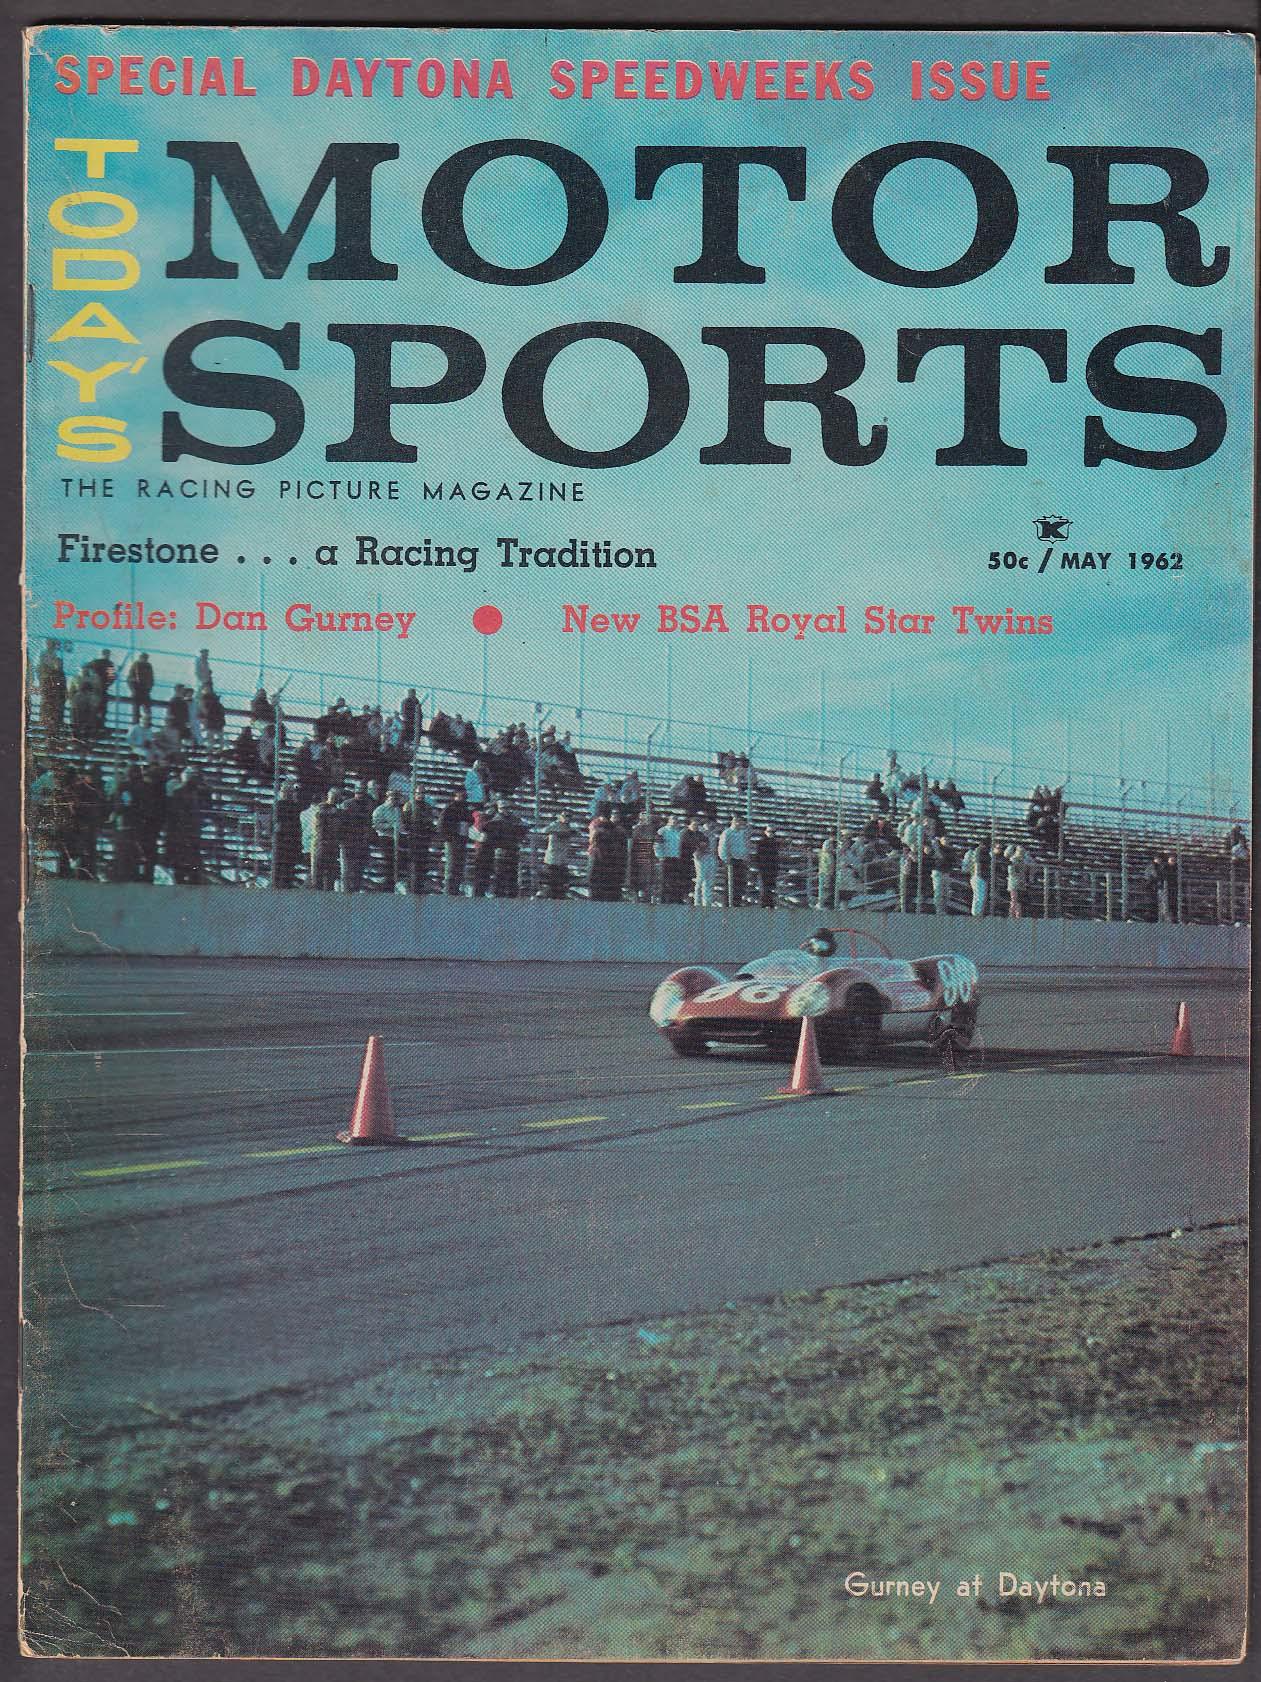 MOTOR SPORTS Buick Wildcat Sports Model Skylark Convertible Jaguar Mk X + 5 1962